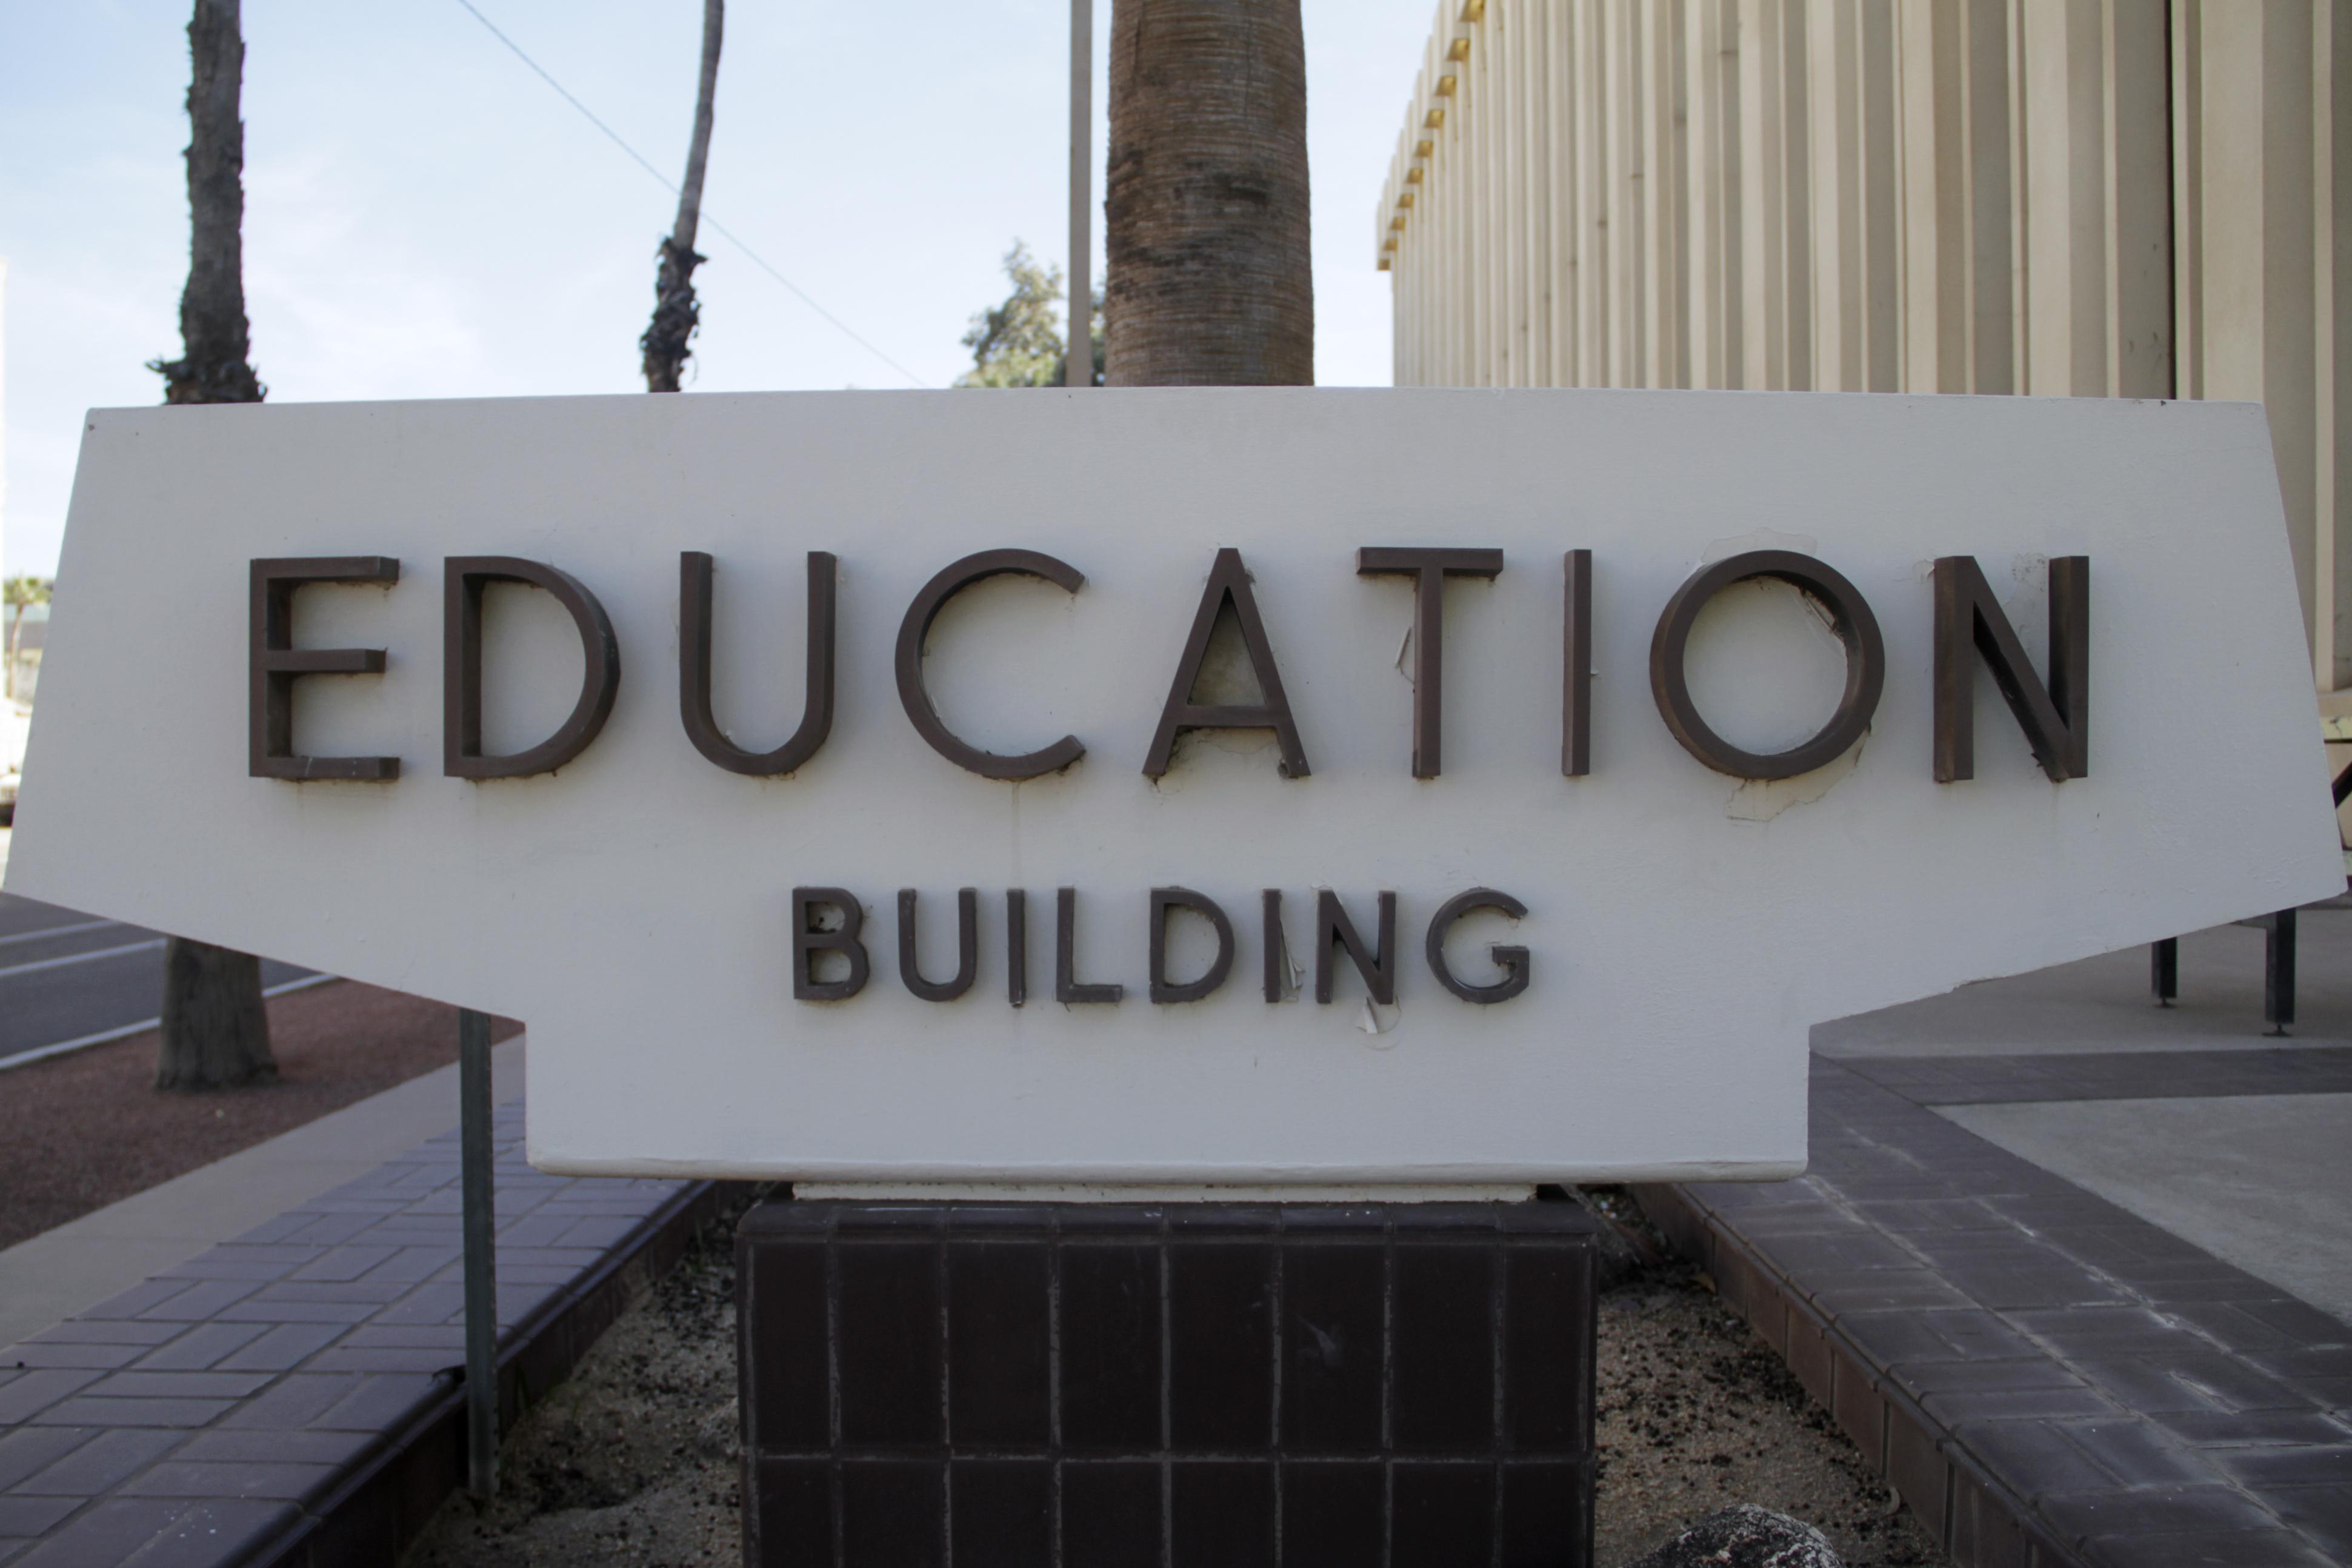 The Arizona Department of Education building